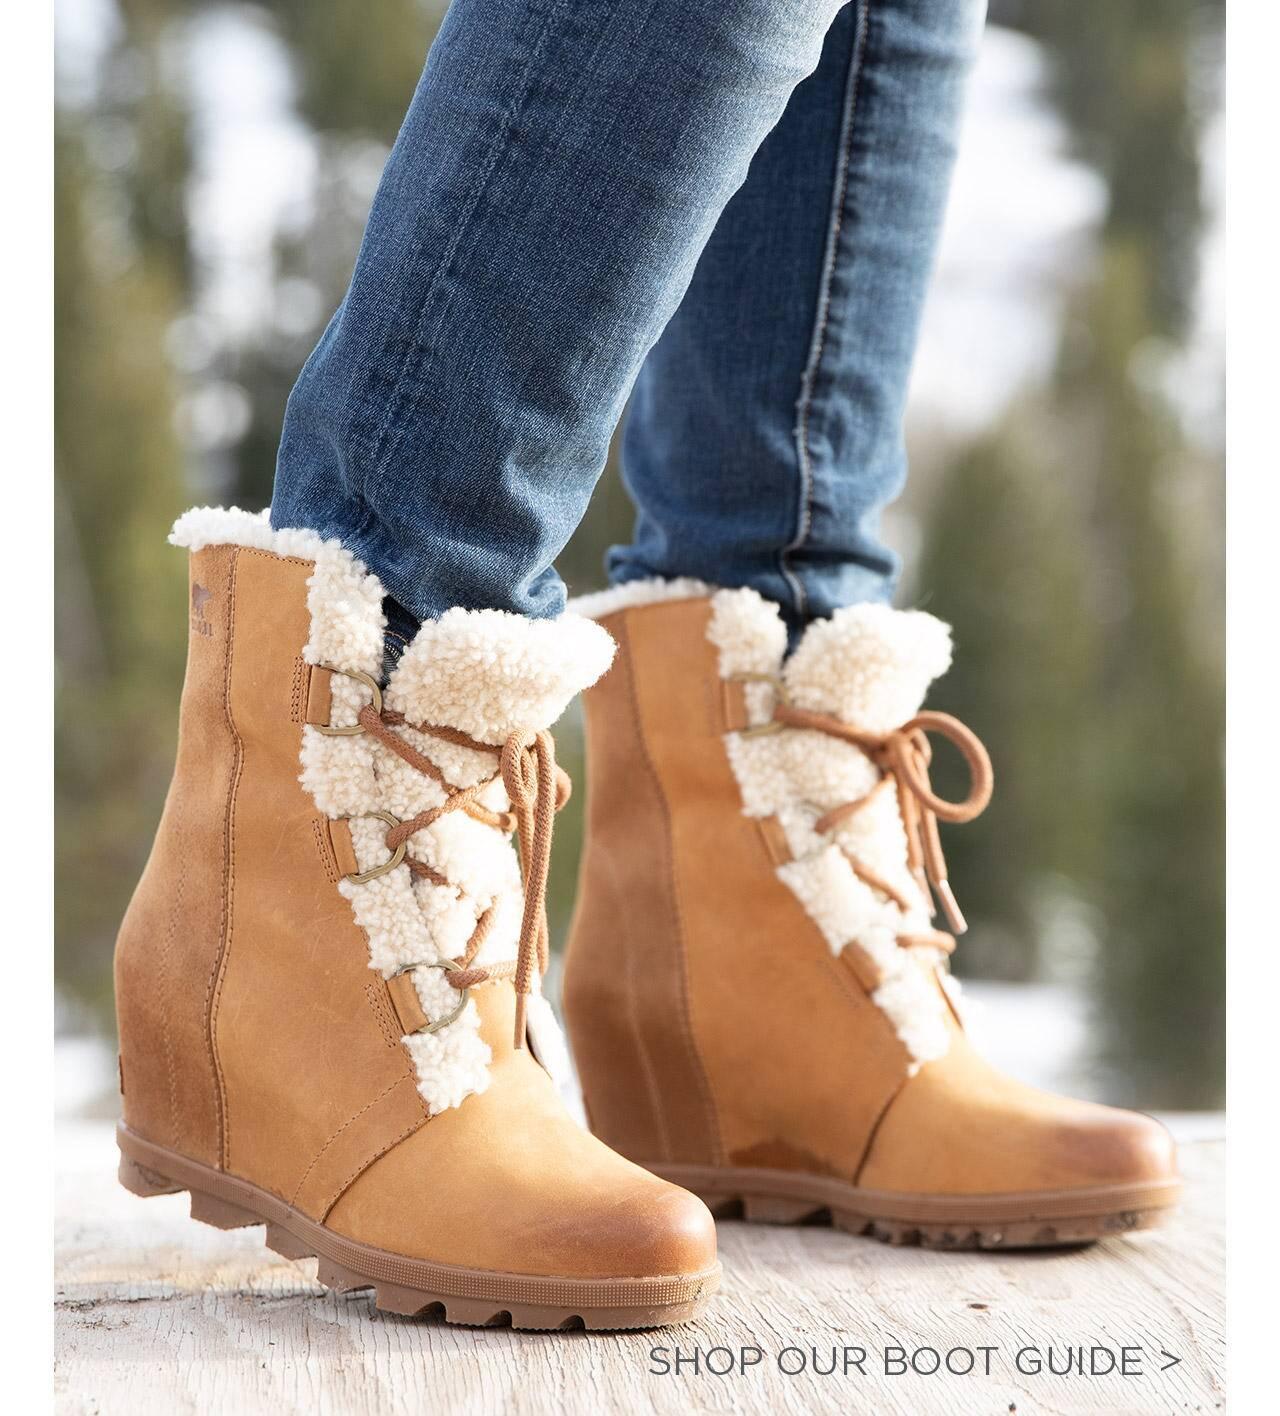 Sundance Boot Guide